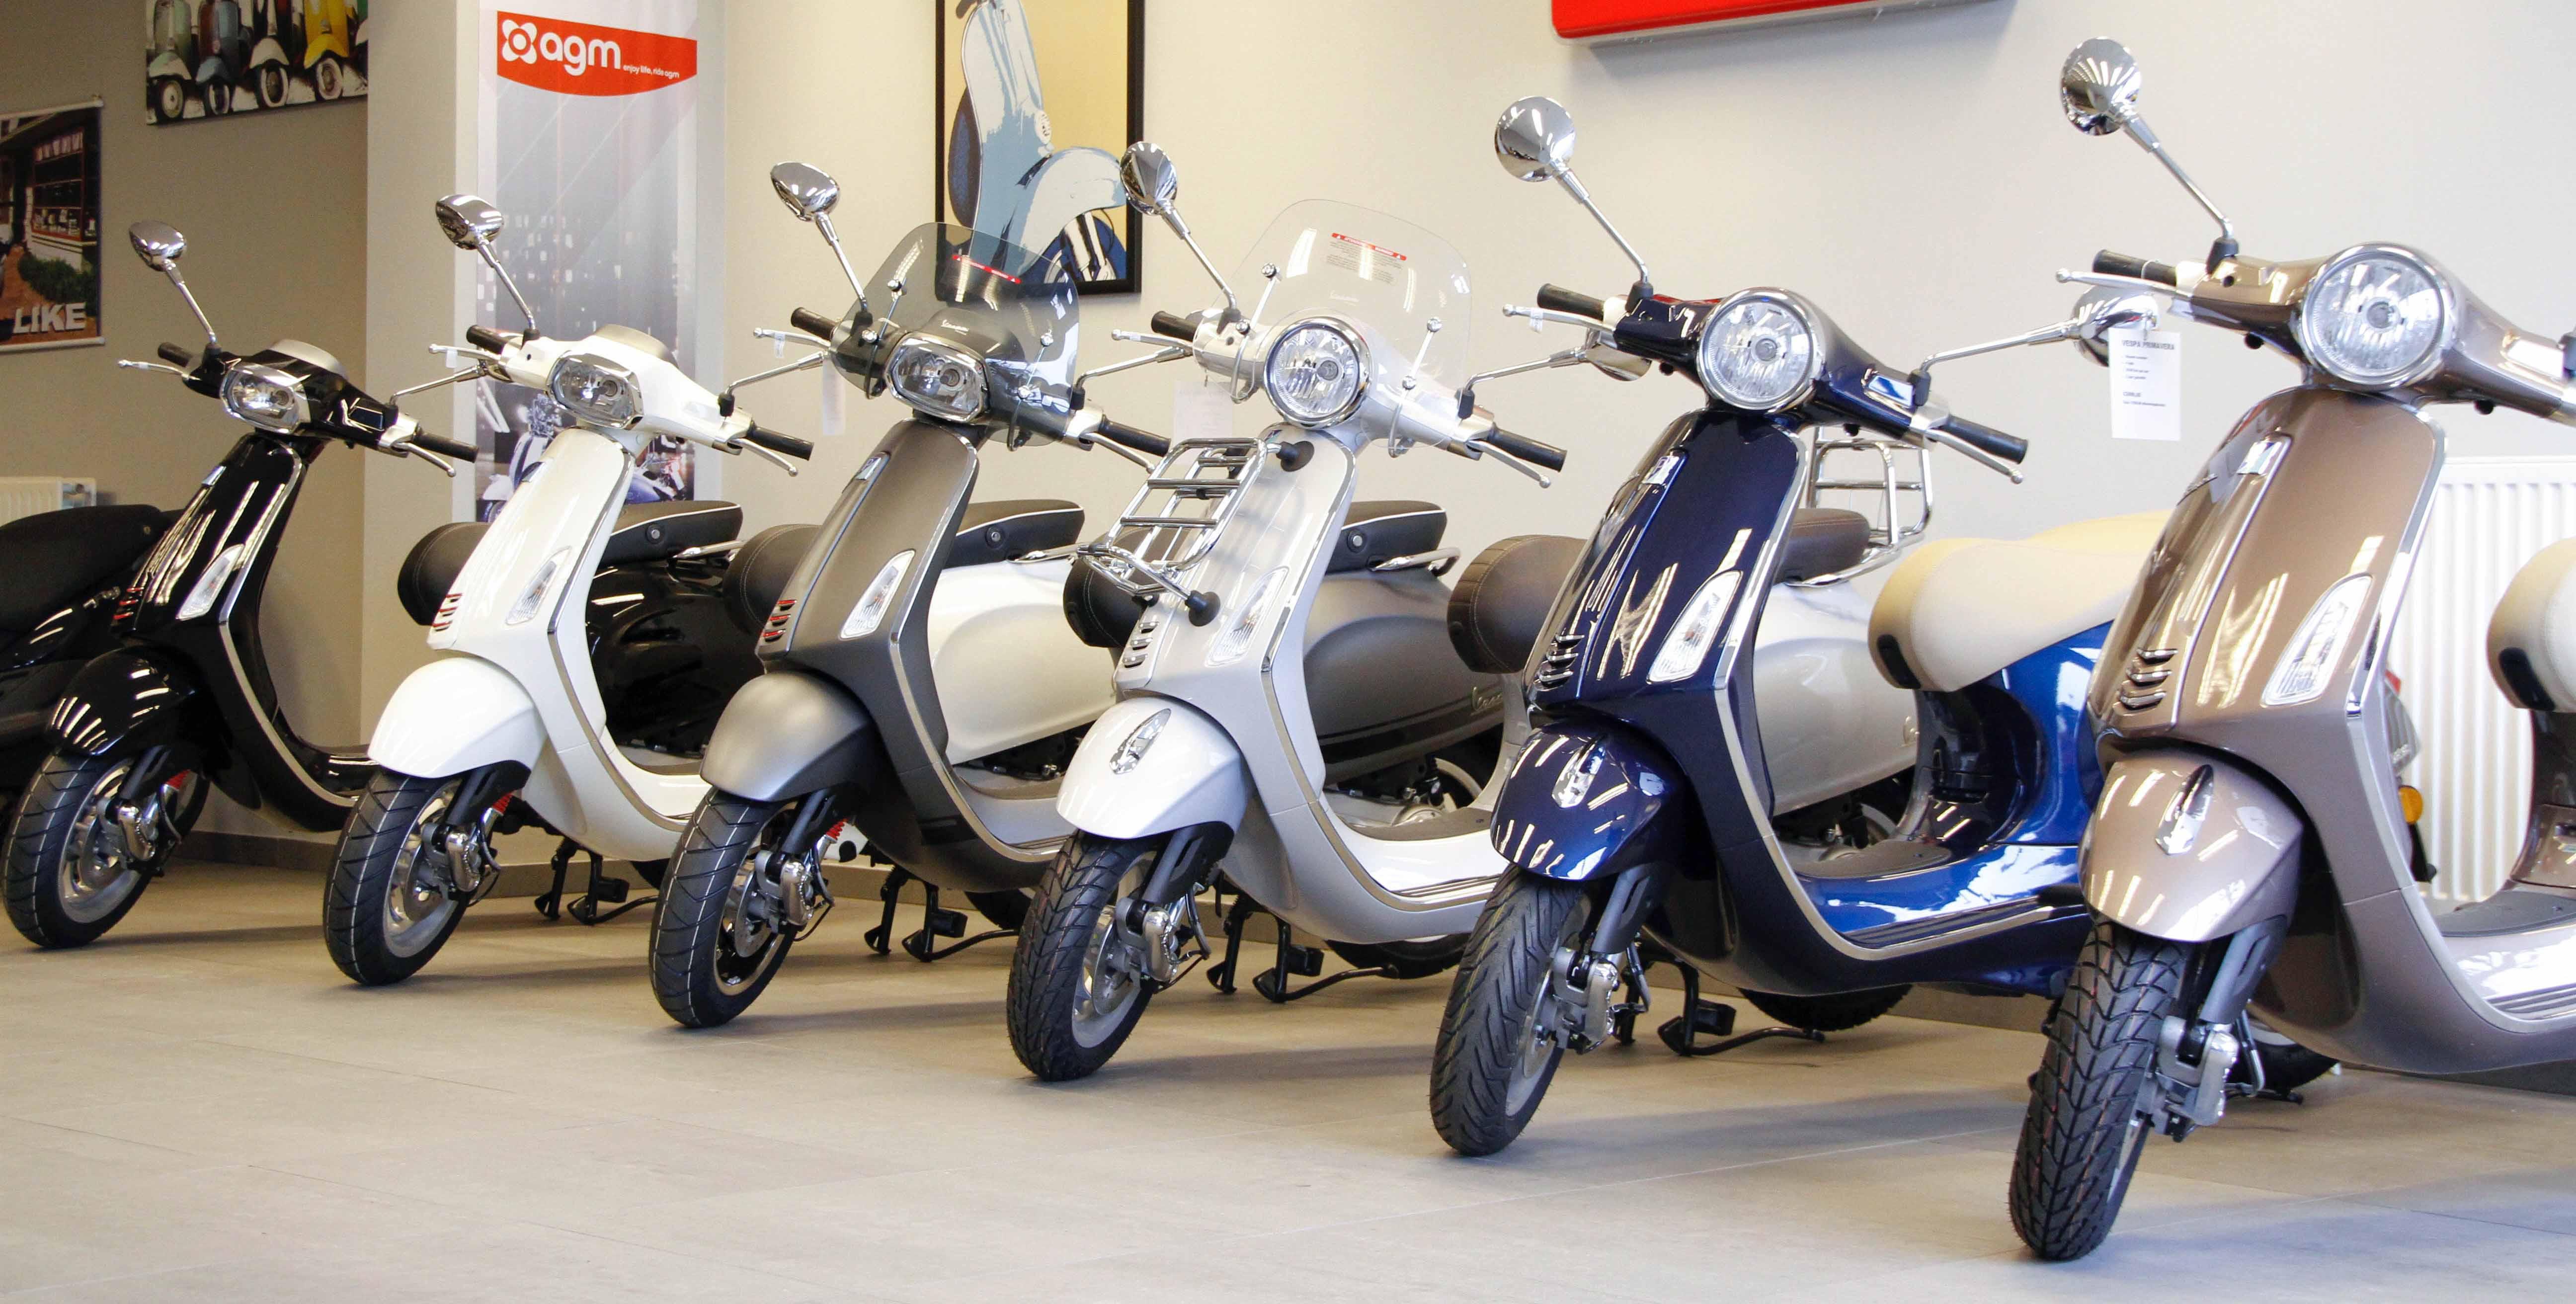 goedkope kymco scooter